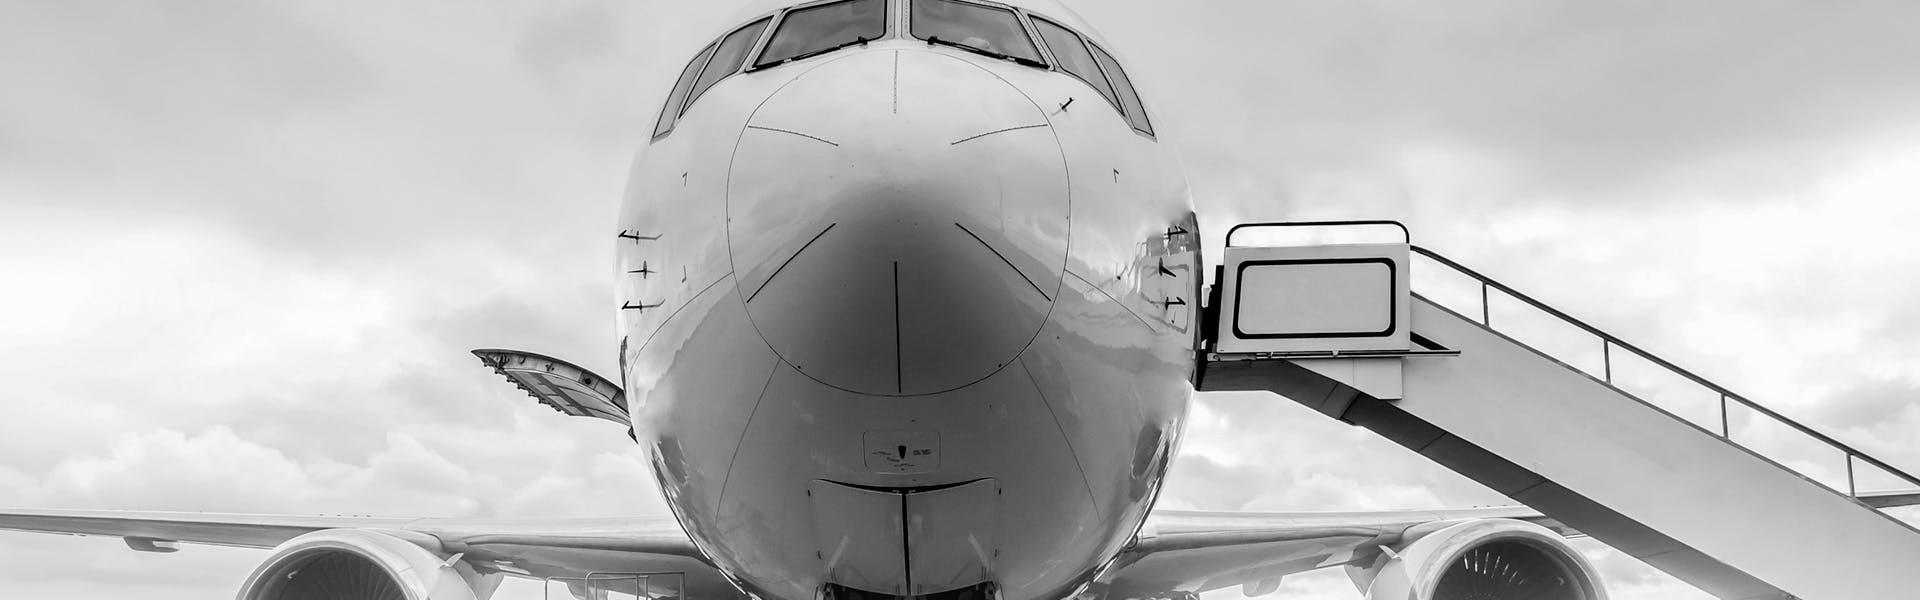 Airbus Aircraft On Tarmac Loading